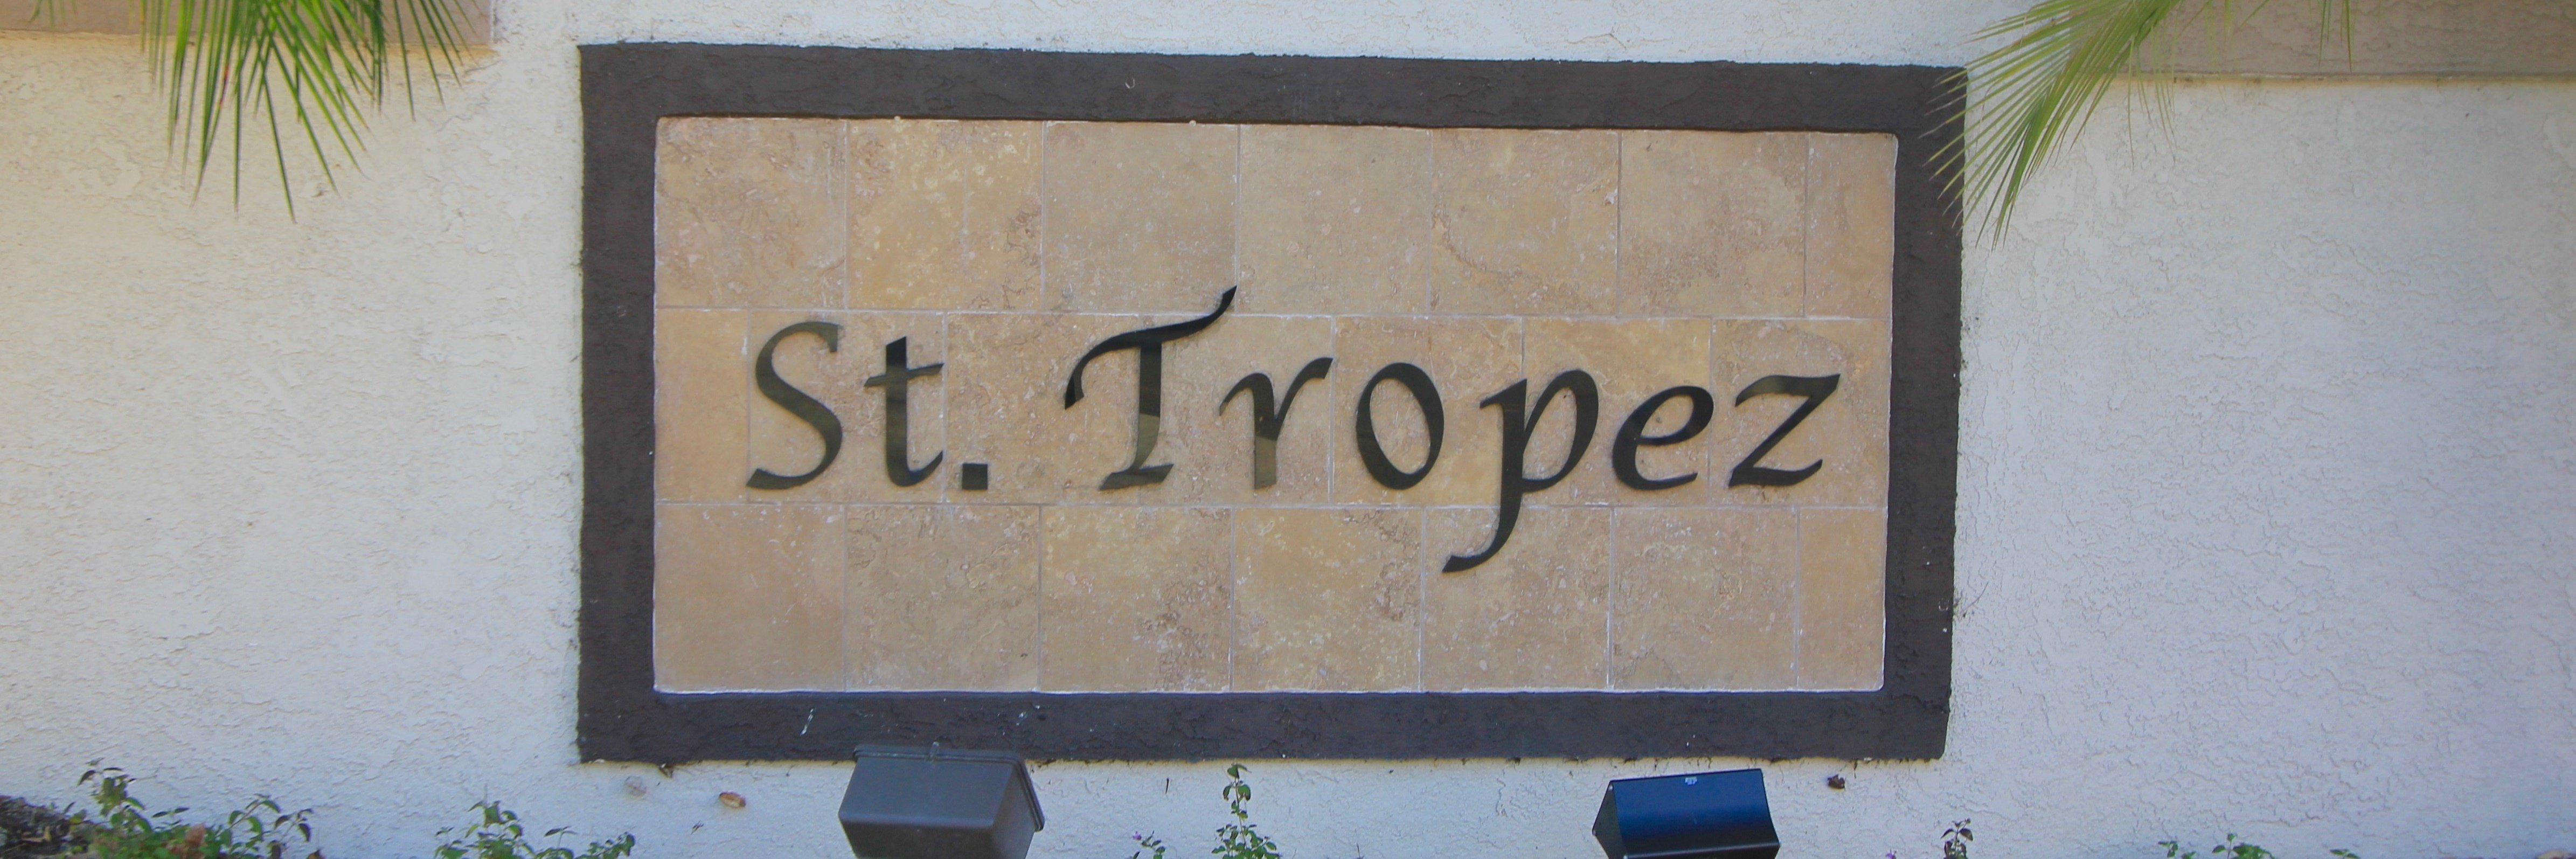 St Tropez Community Marquee in Aliso Viejo Ca